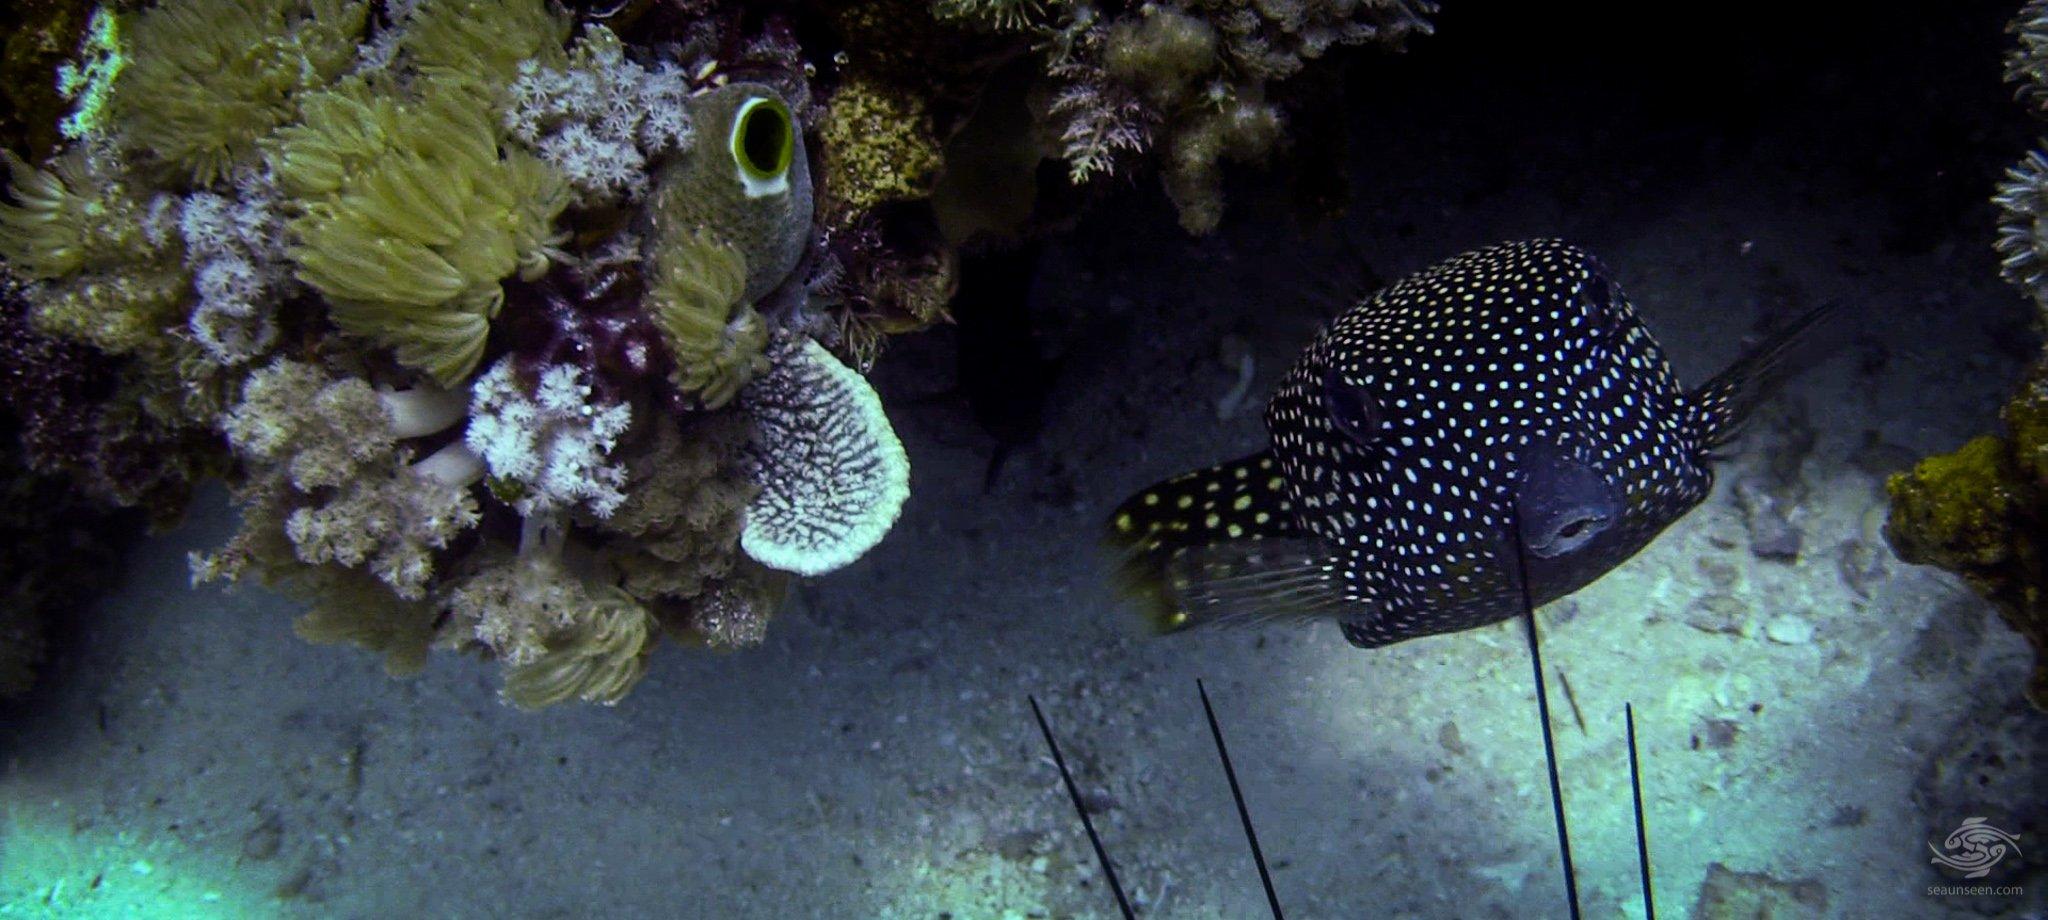 White Spotted Boxfish - Seaunseen